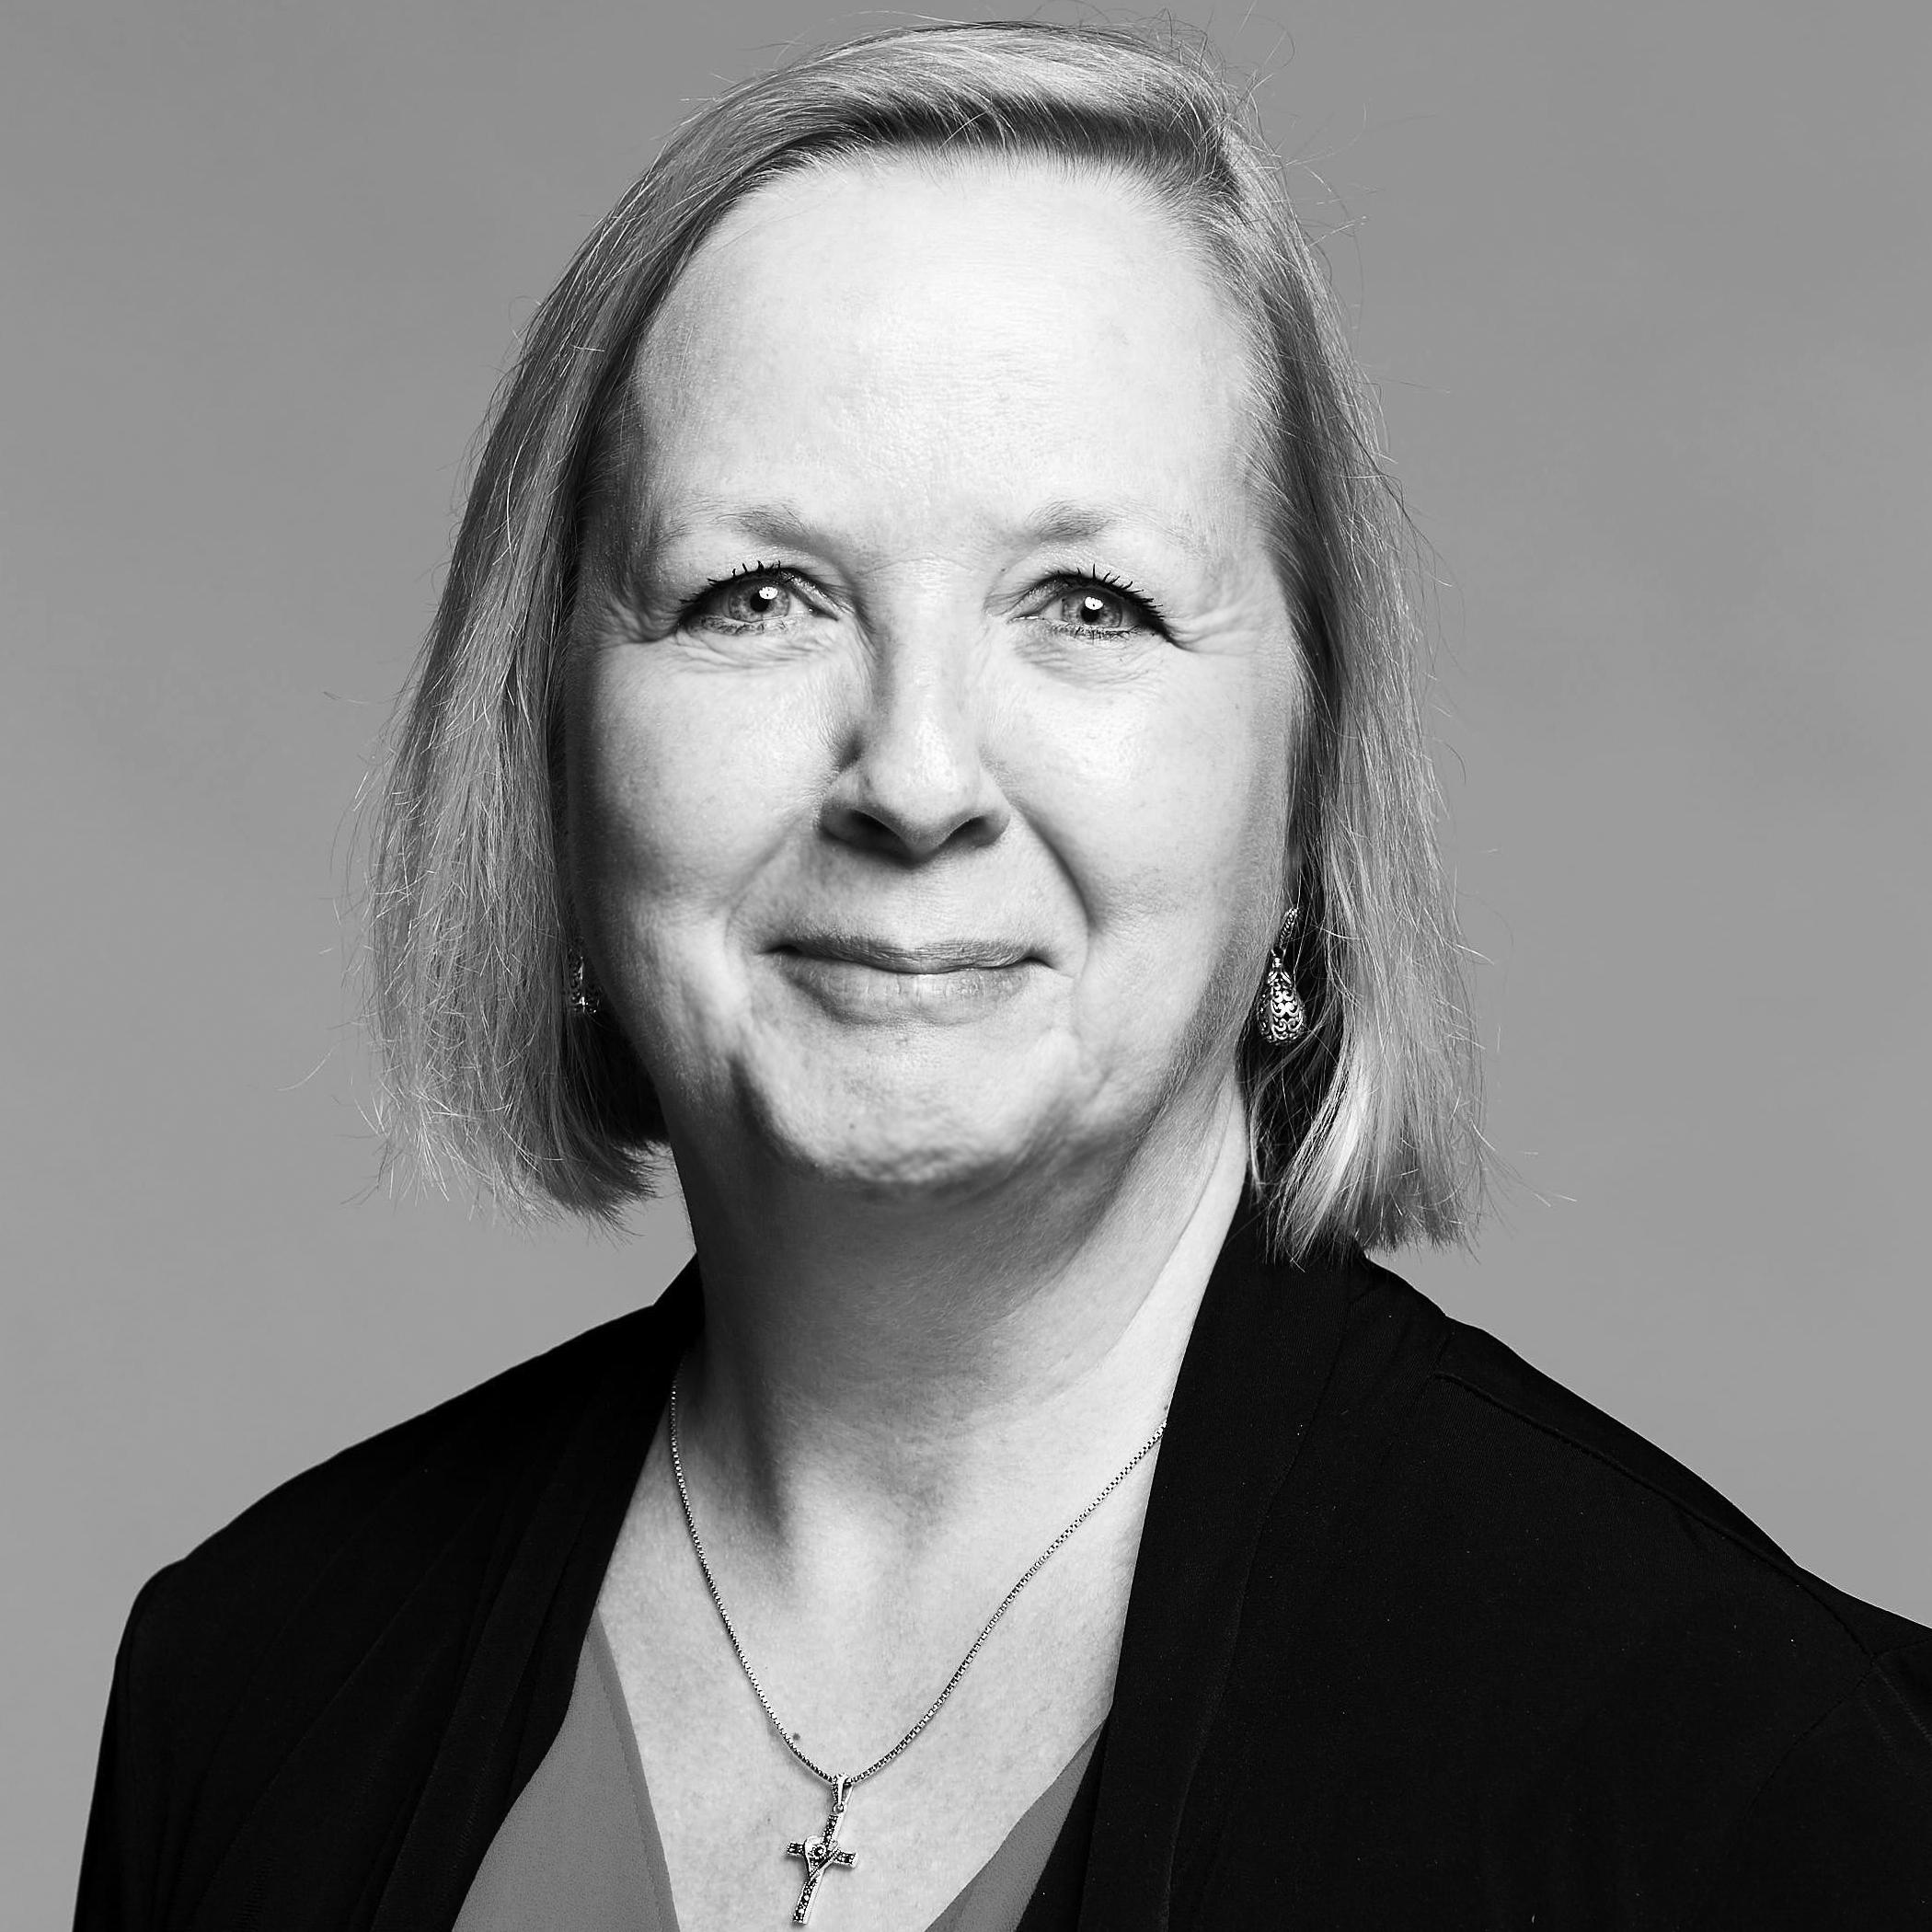 Julie Zindle